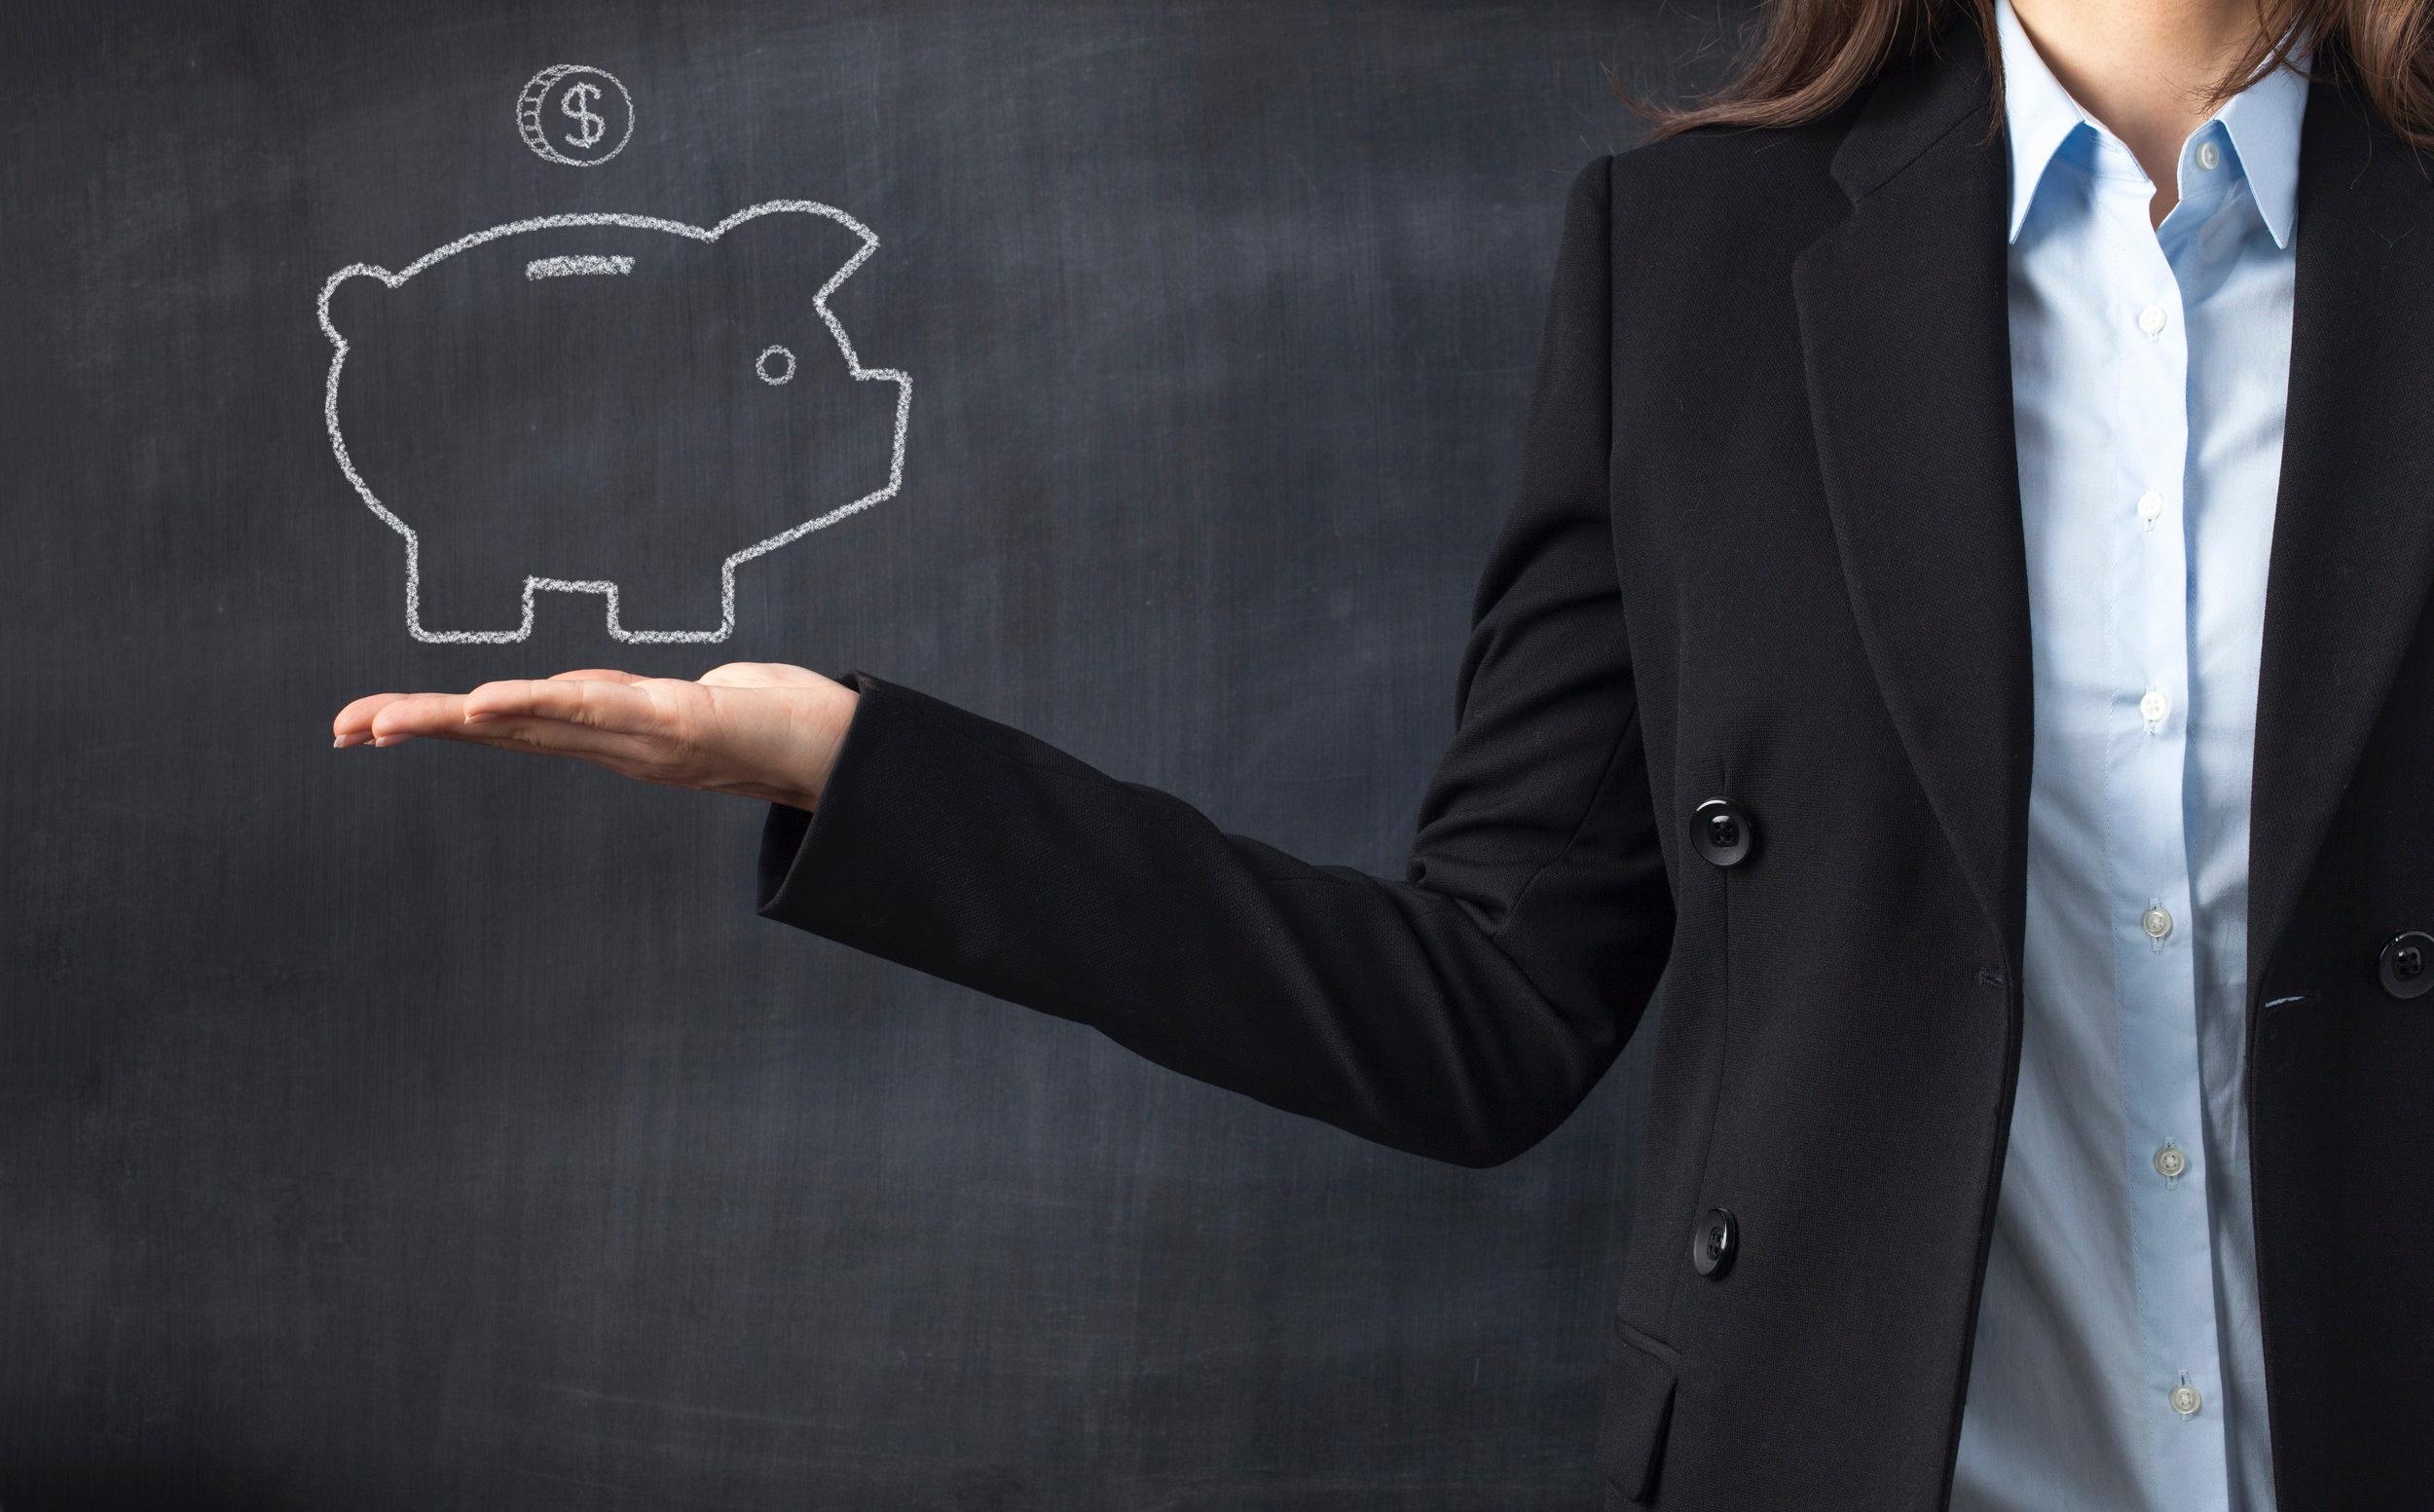 powerbitches-money-advice-women-entrepeneurs.jpg